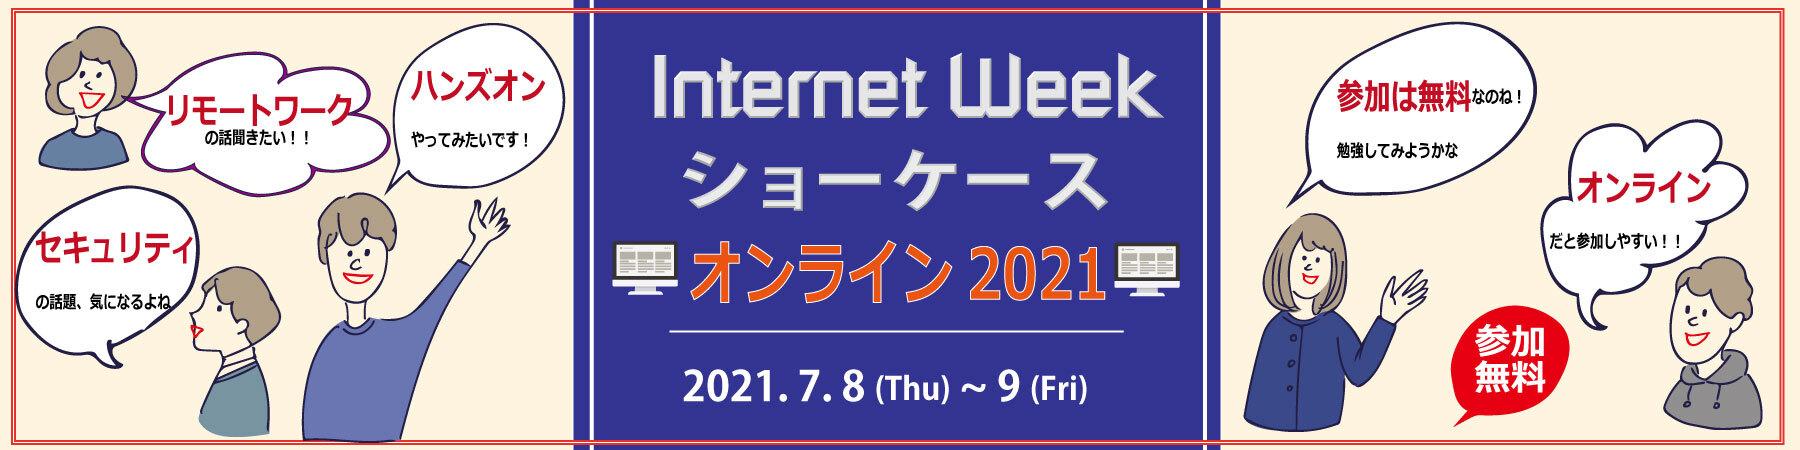 Internet Week ショーケース オンライン